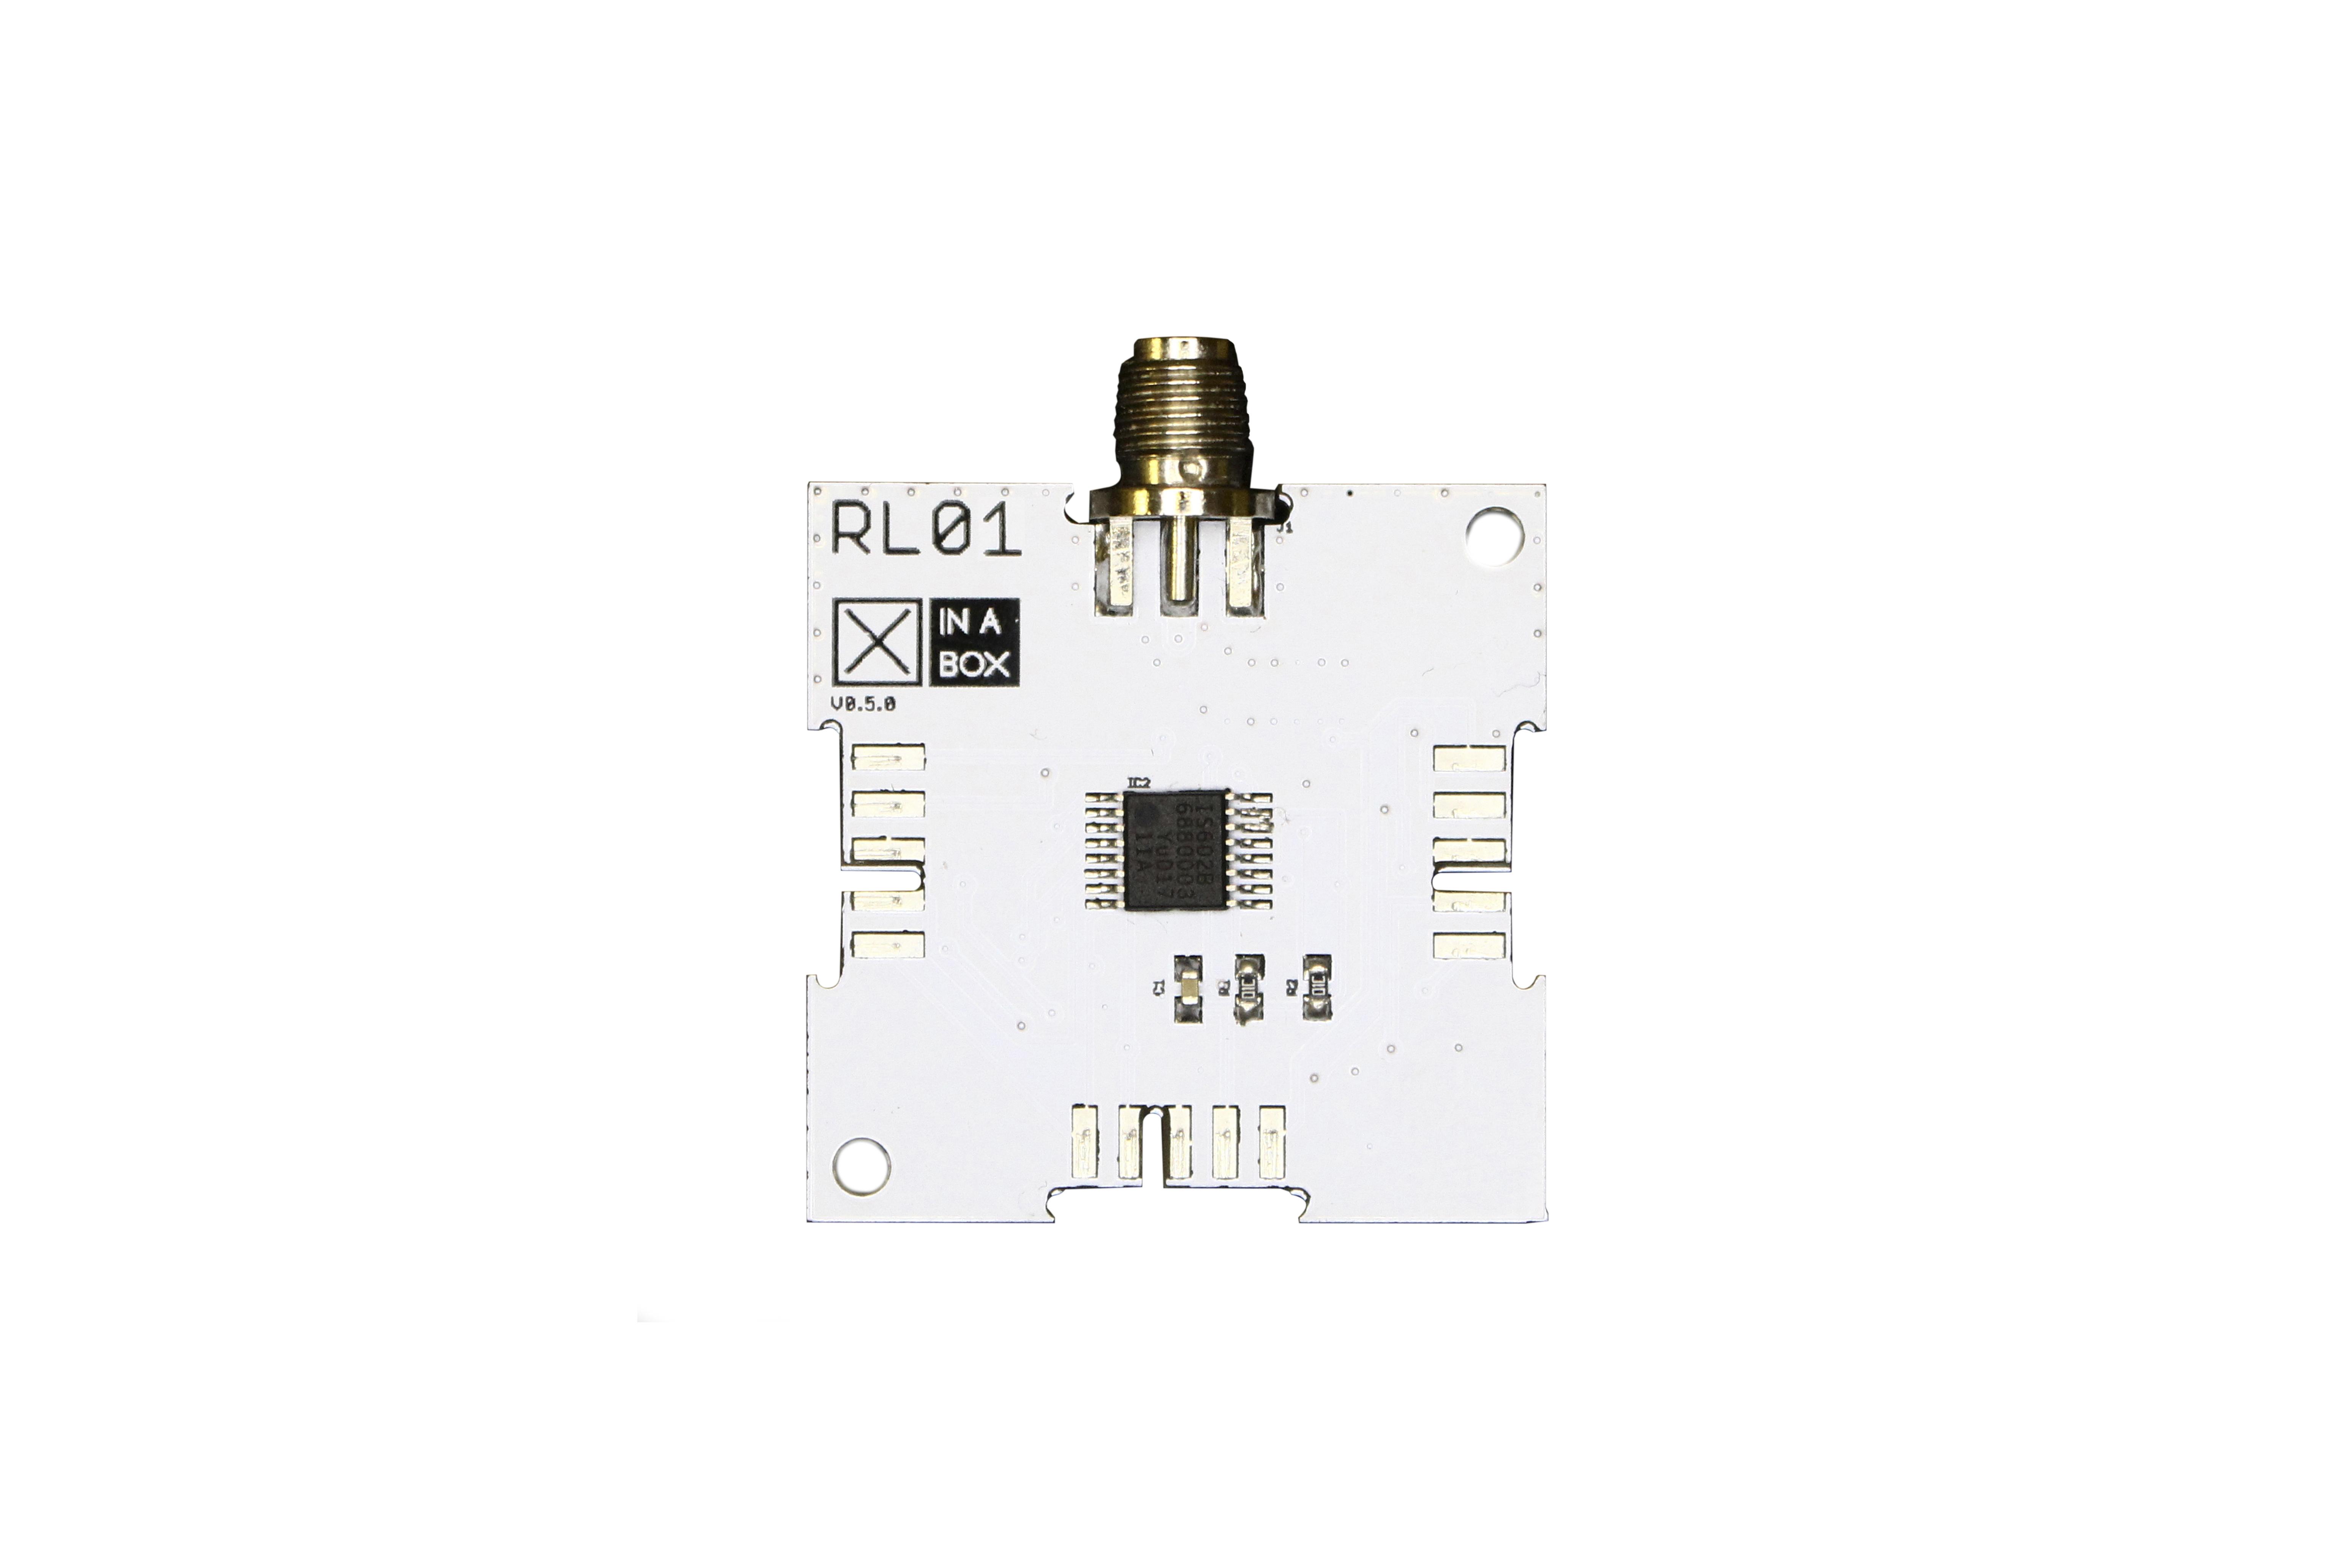 LoRa Radio 433,92 MHz RFM96W, SC18IS602B